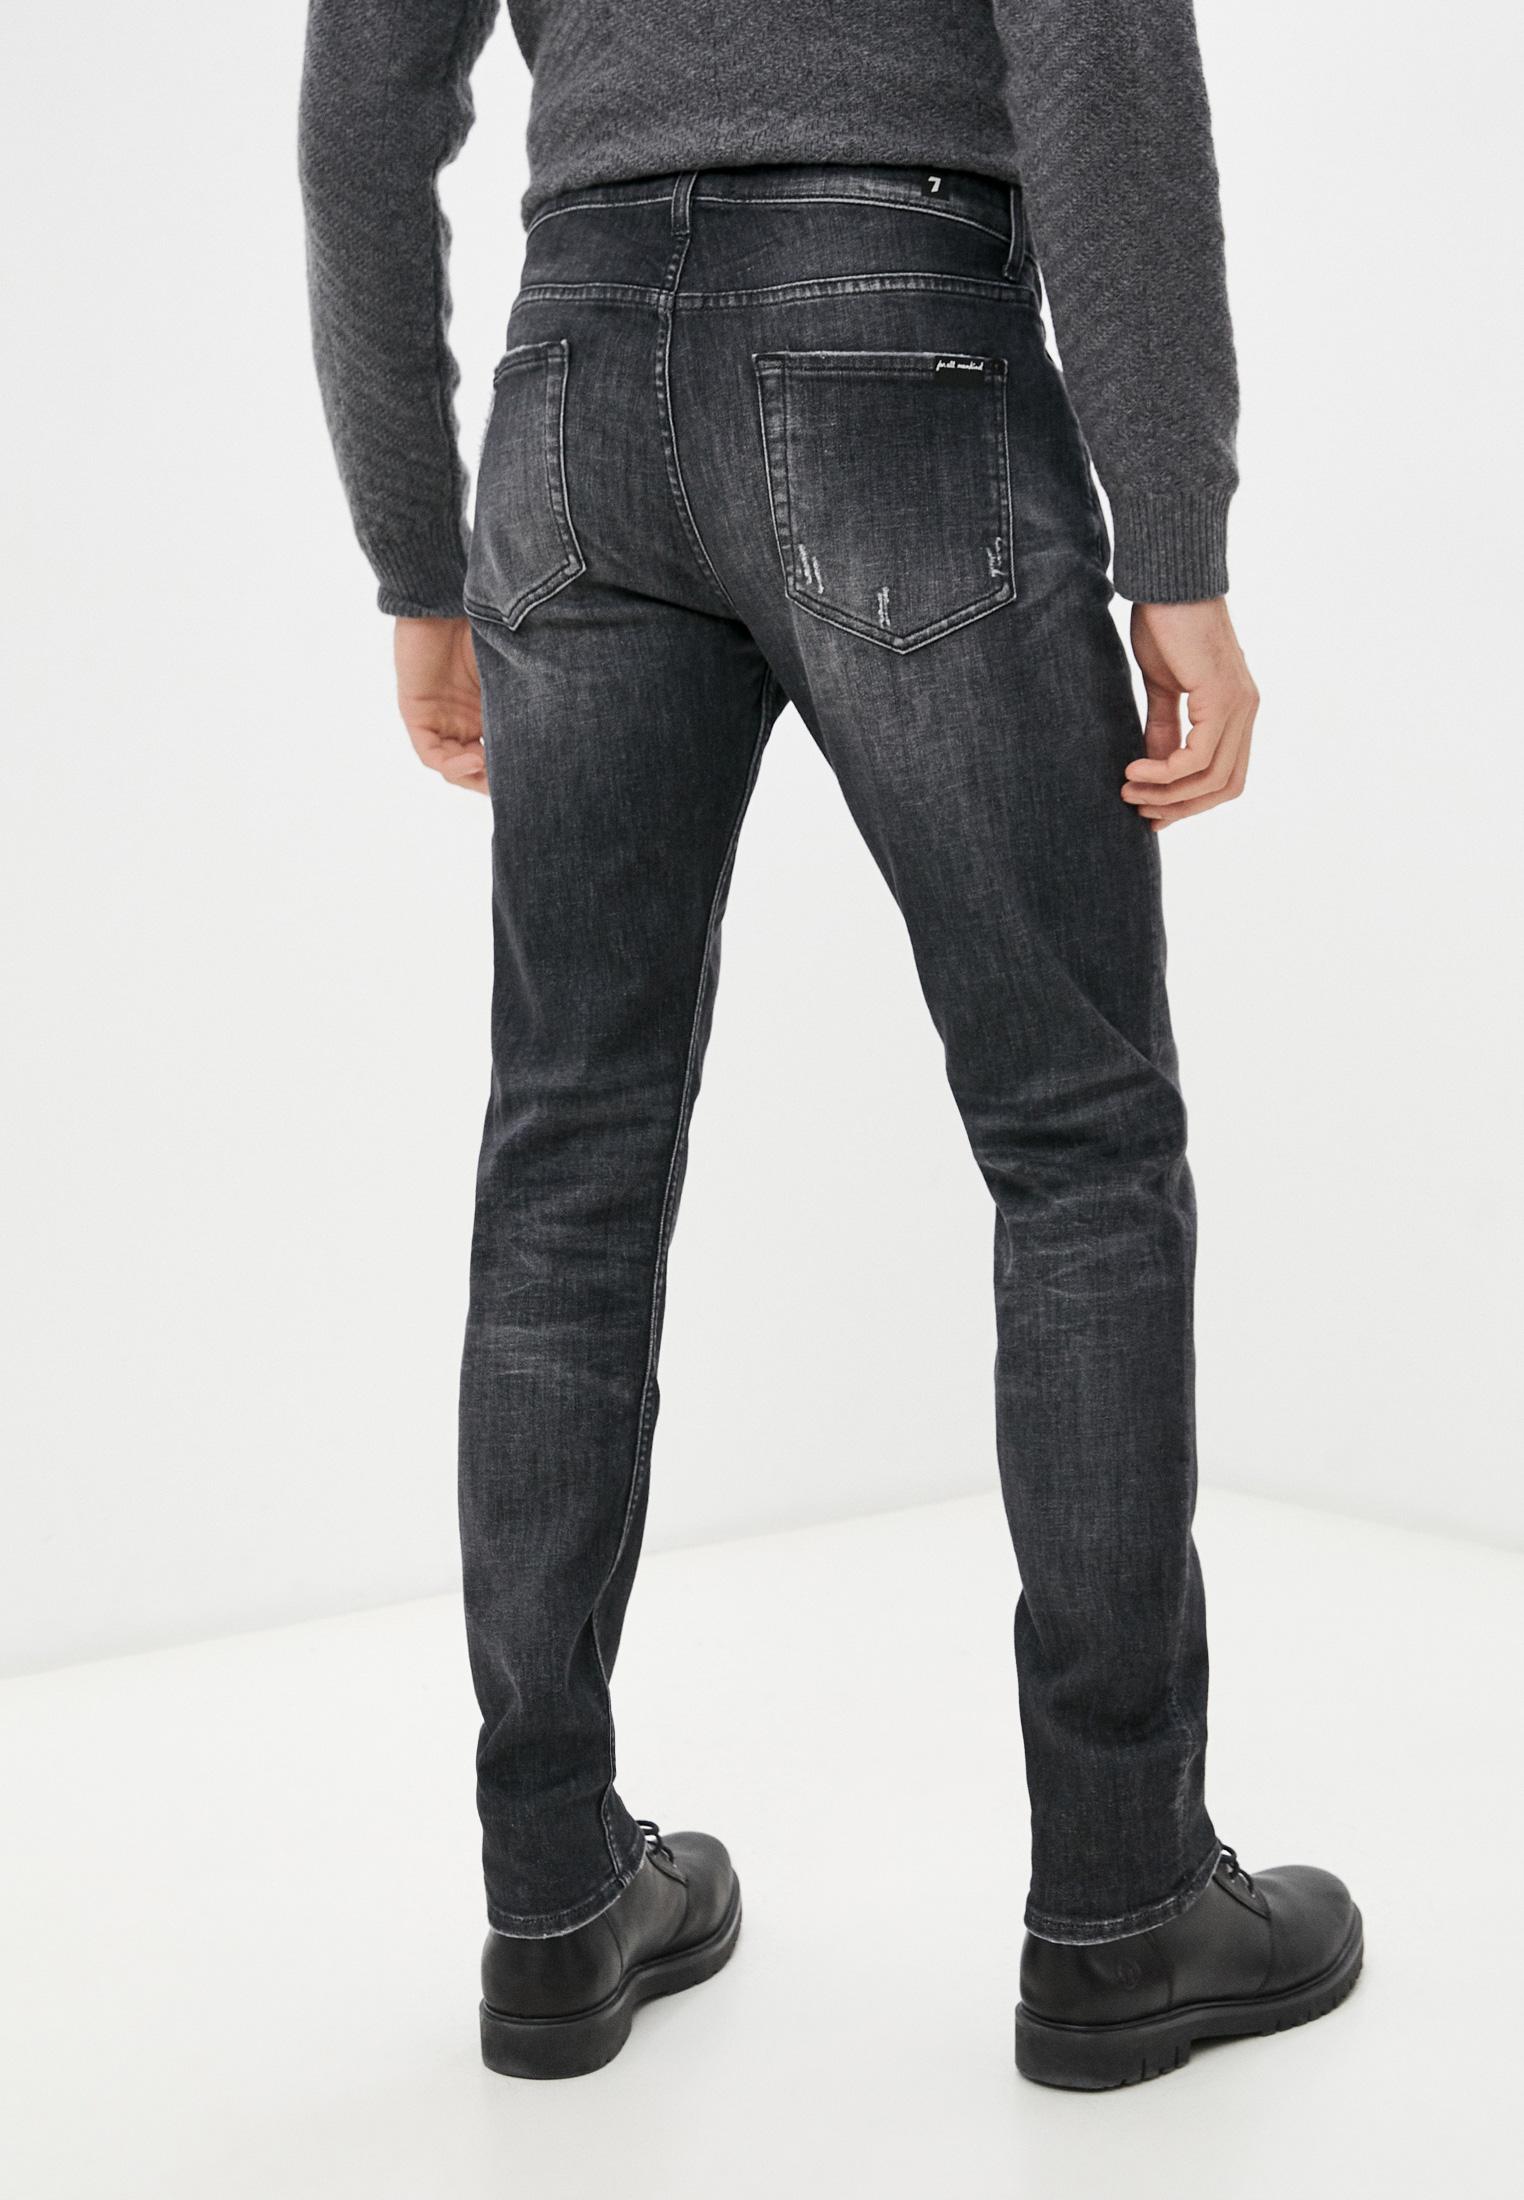 Зауженные джинсы 7 For All Mankind (7 Фо Олл Мэнкайнд) JSMXU790TH: изображение 4